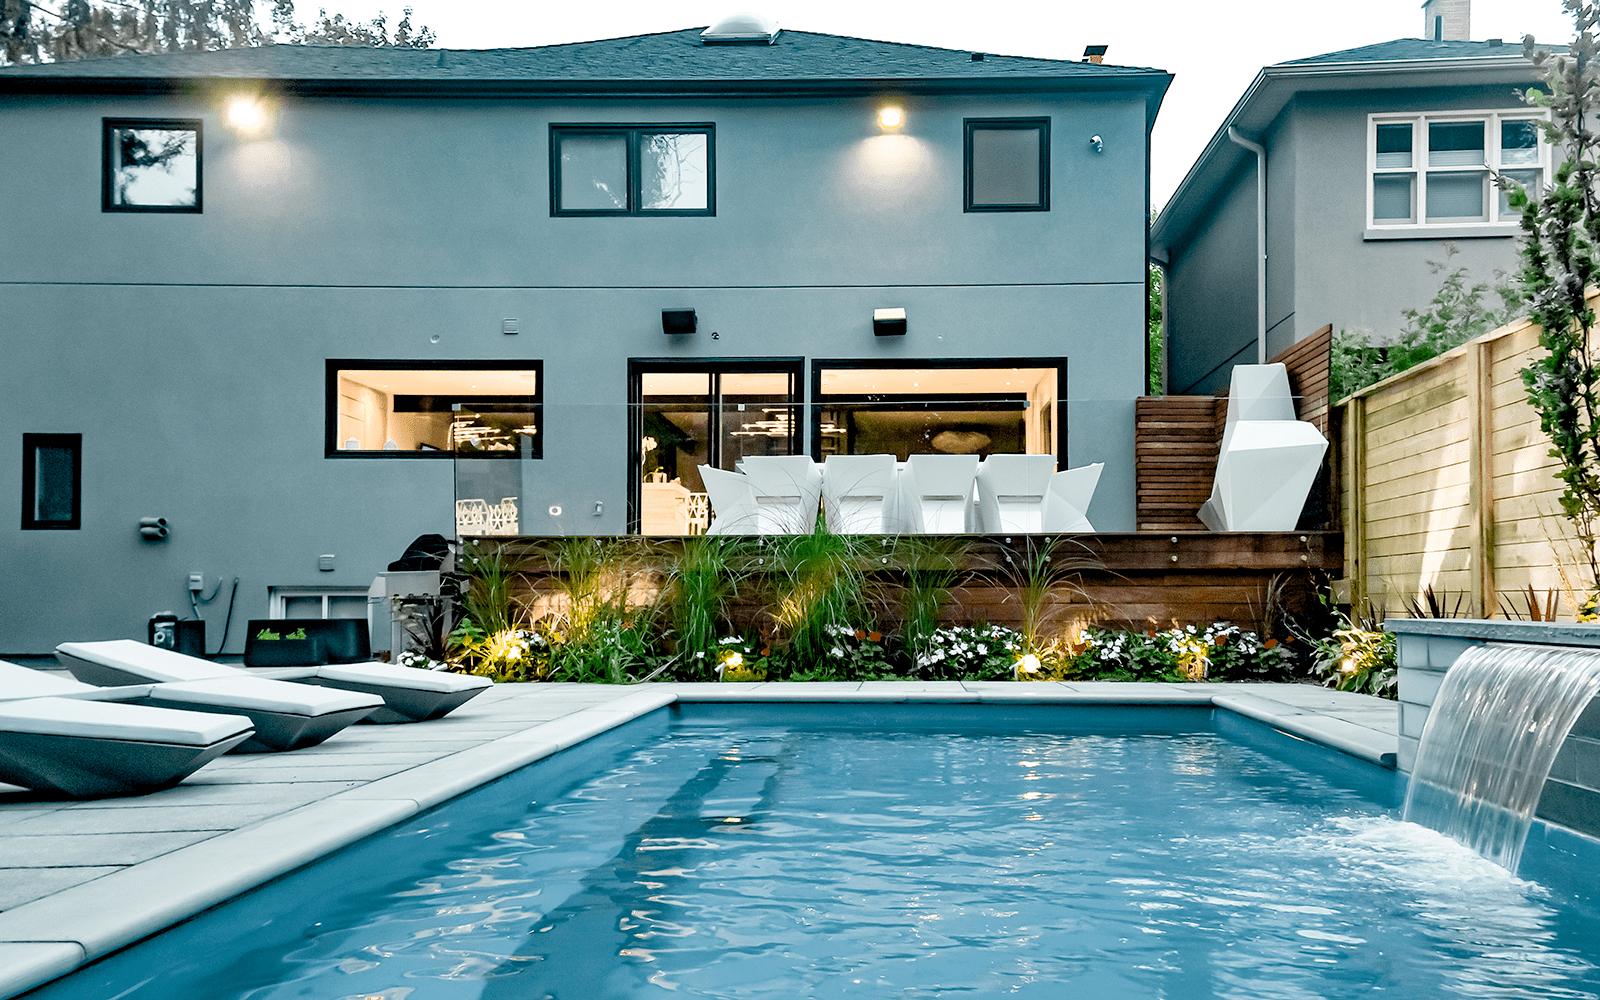 Sekler Residence, Complete Toronto Backyard Landscape Design Project with Fiberglass Pool Installation and Water Feature, Interlocking, Cedar Fence, Composite Decking, Frameless Glass Railings & Interlocking by Toronto Landscaping Company.